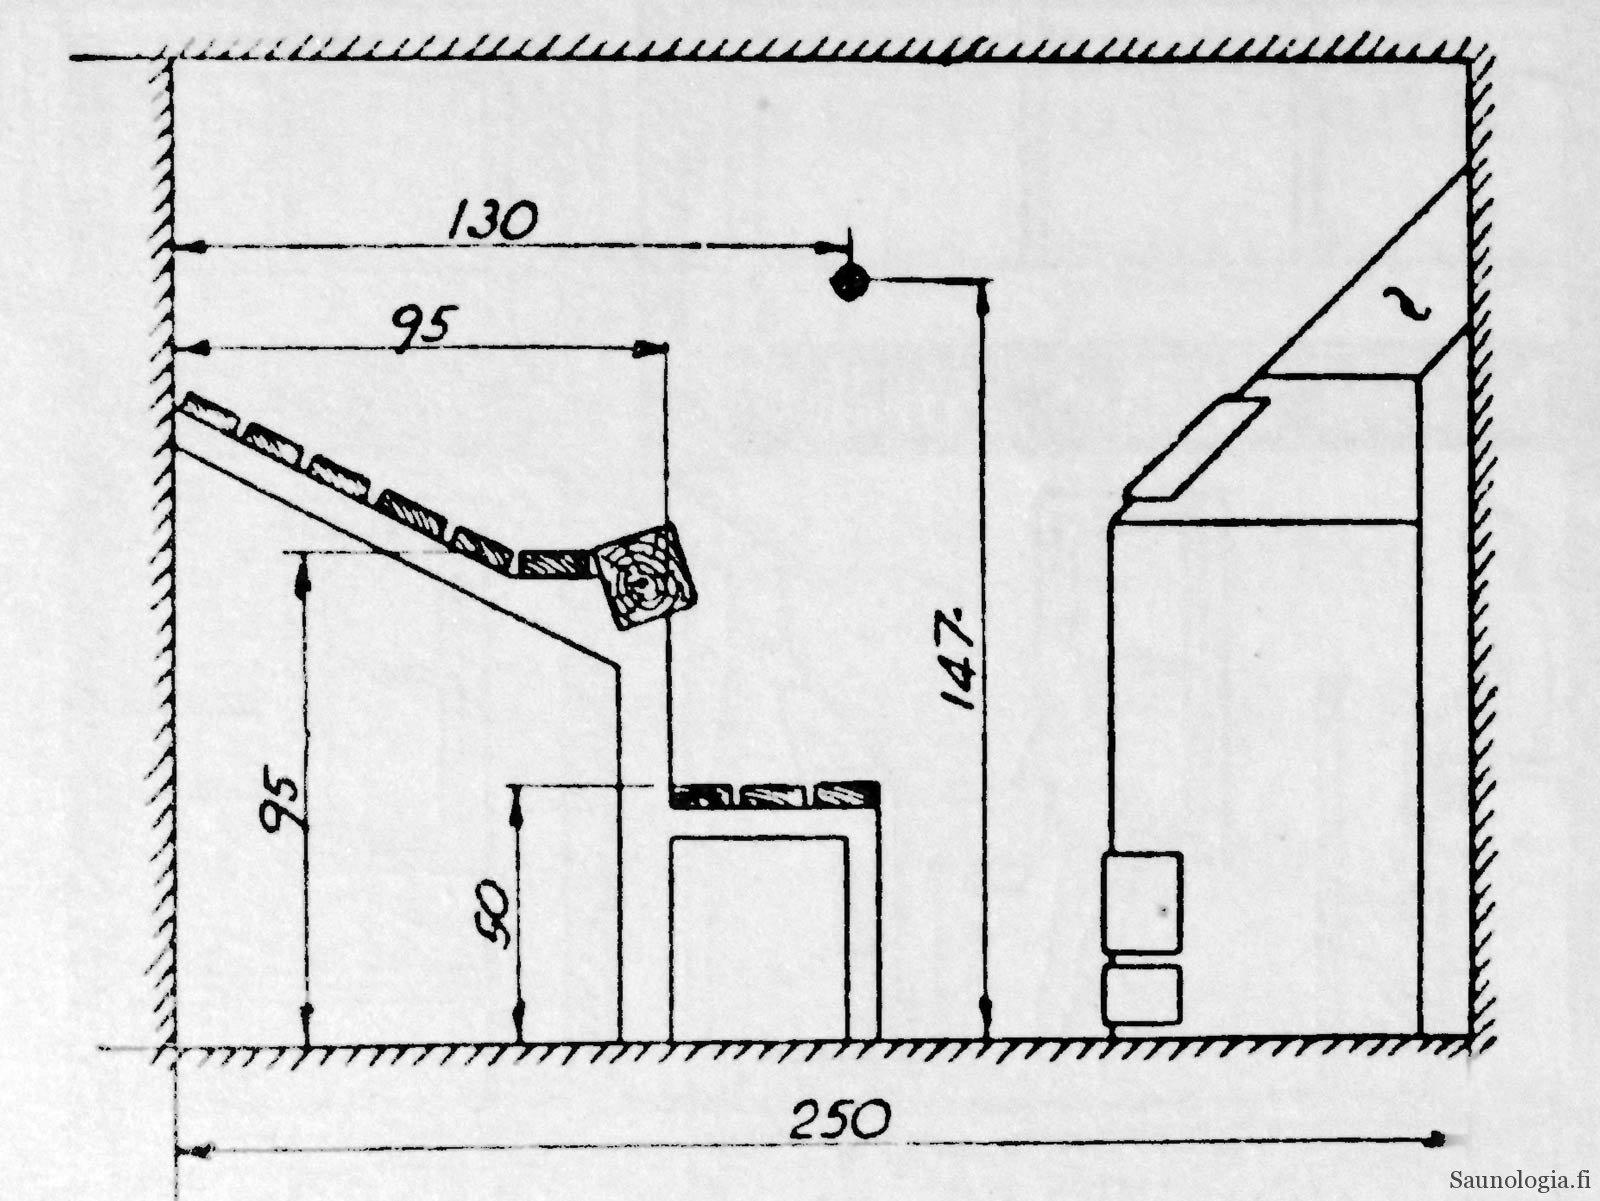 1955-kallion_lauteet-viherjuuri